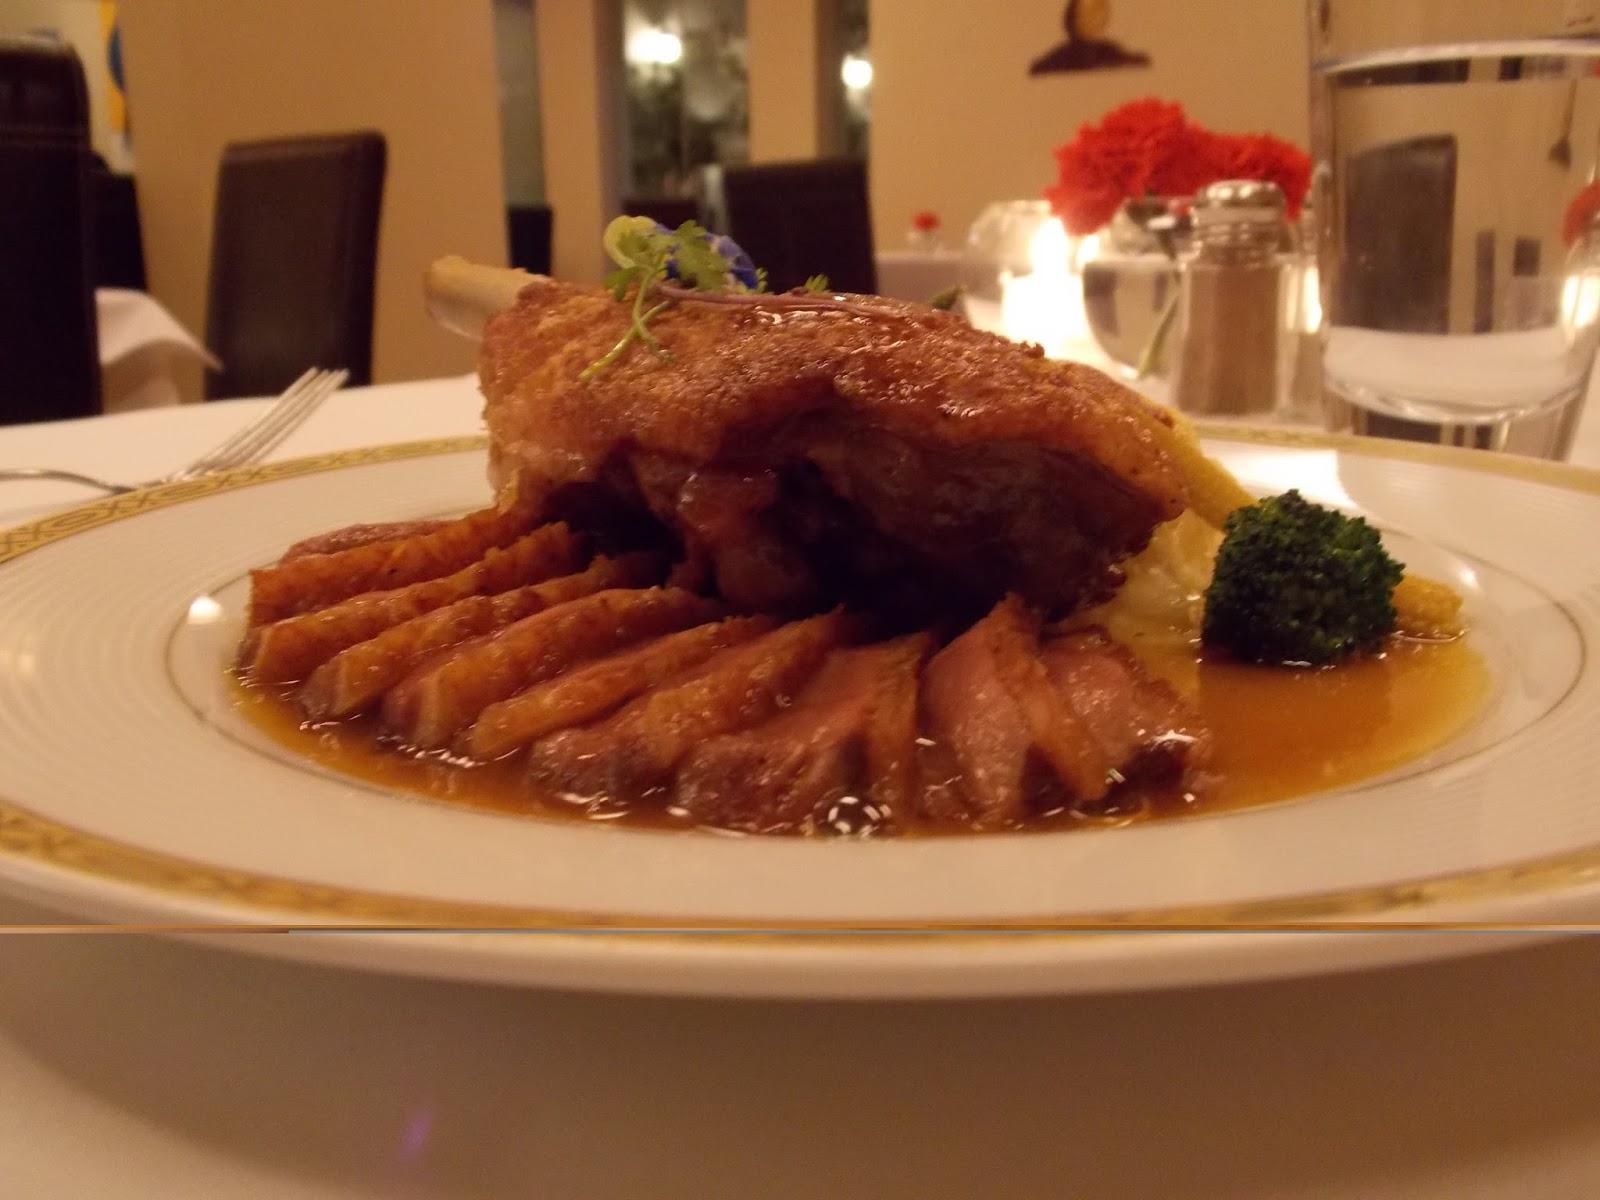 Alestilodefa zonapicnic la comida francesa en cusco for Comida francesa gourmet